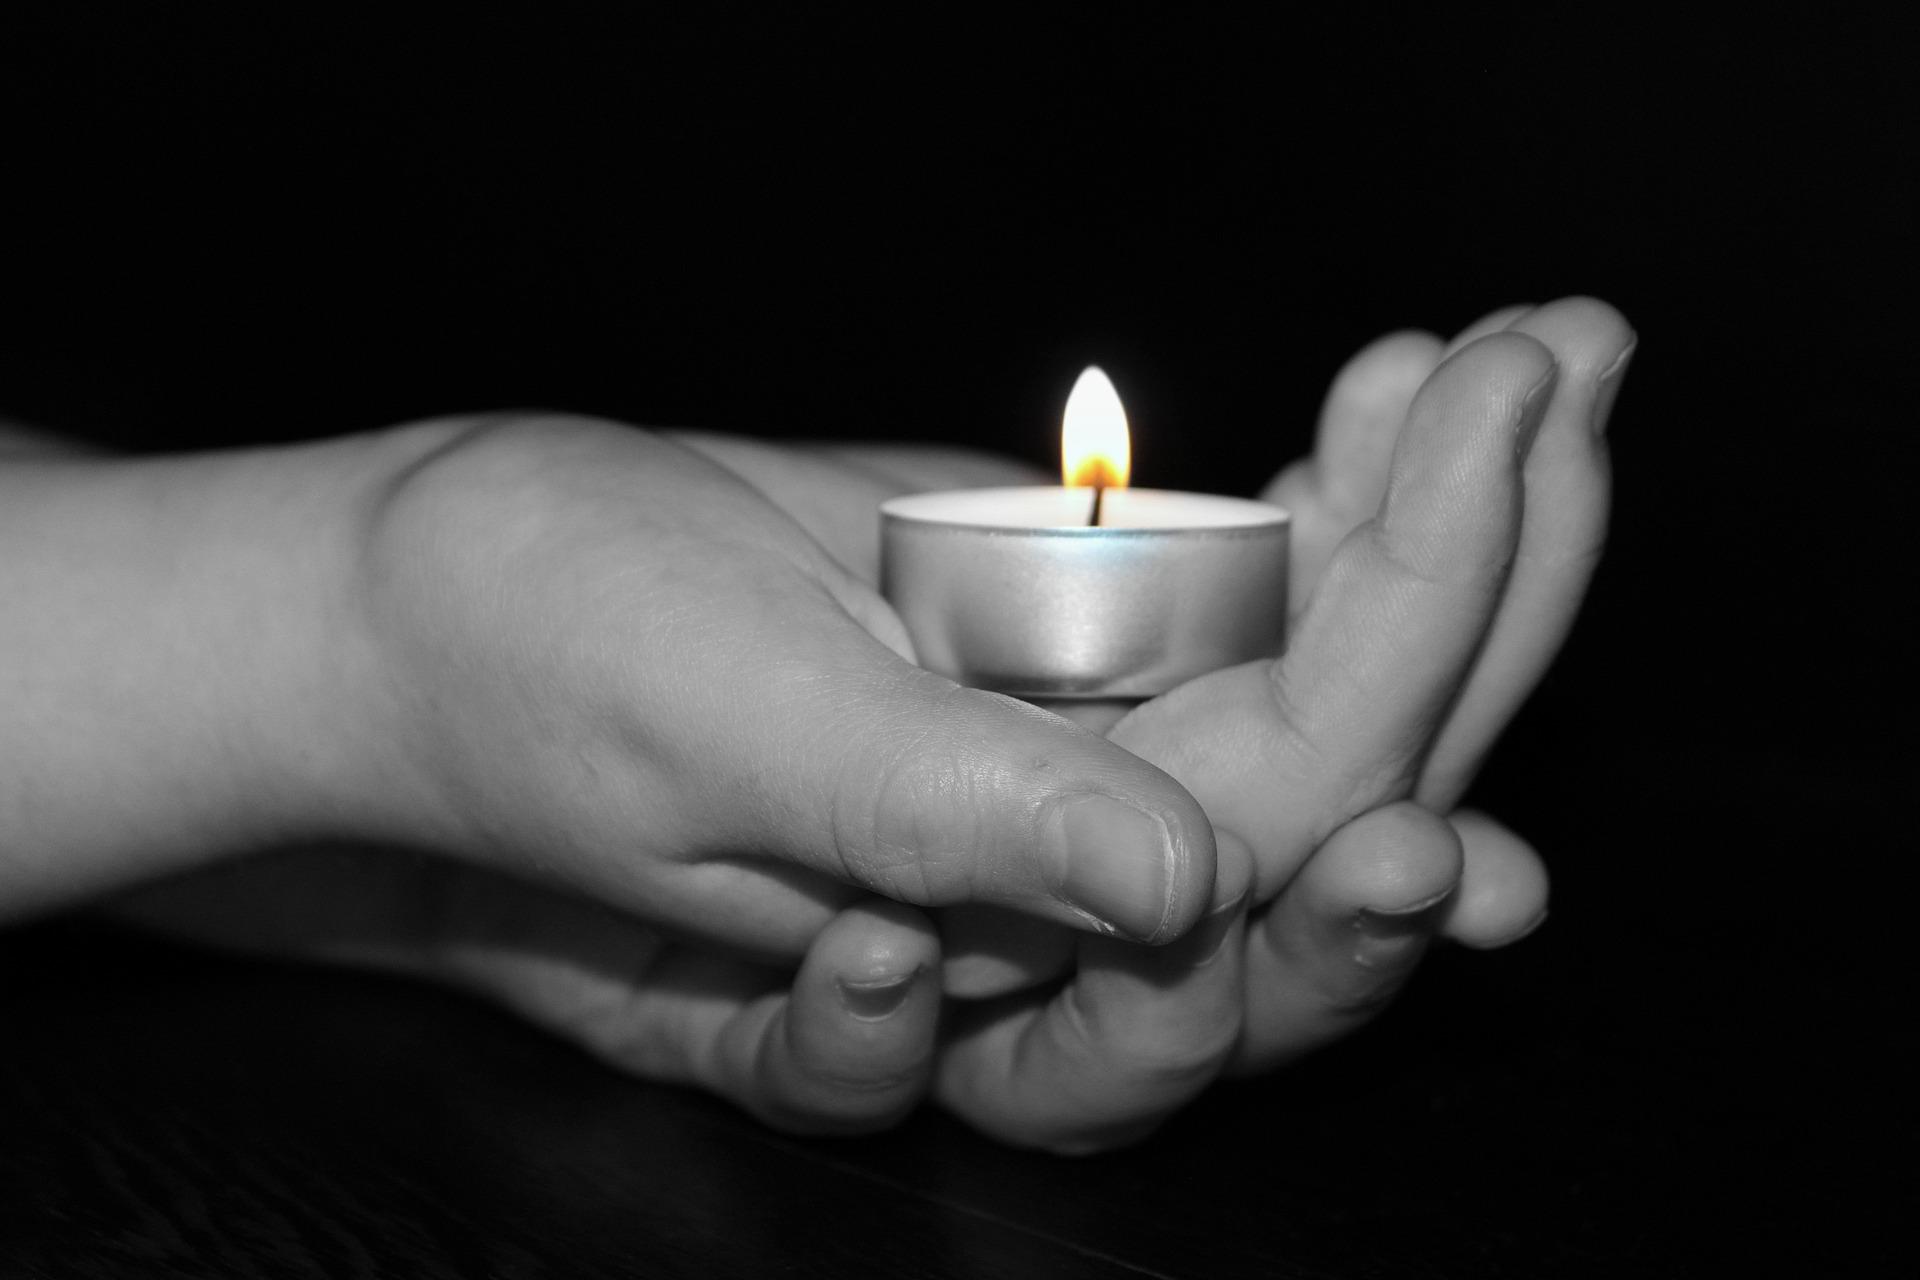 candle-1239891_1920